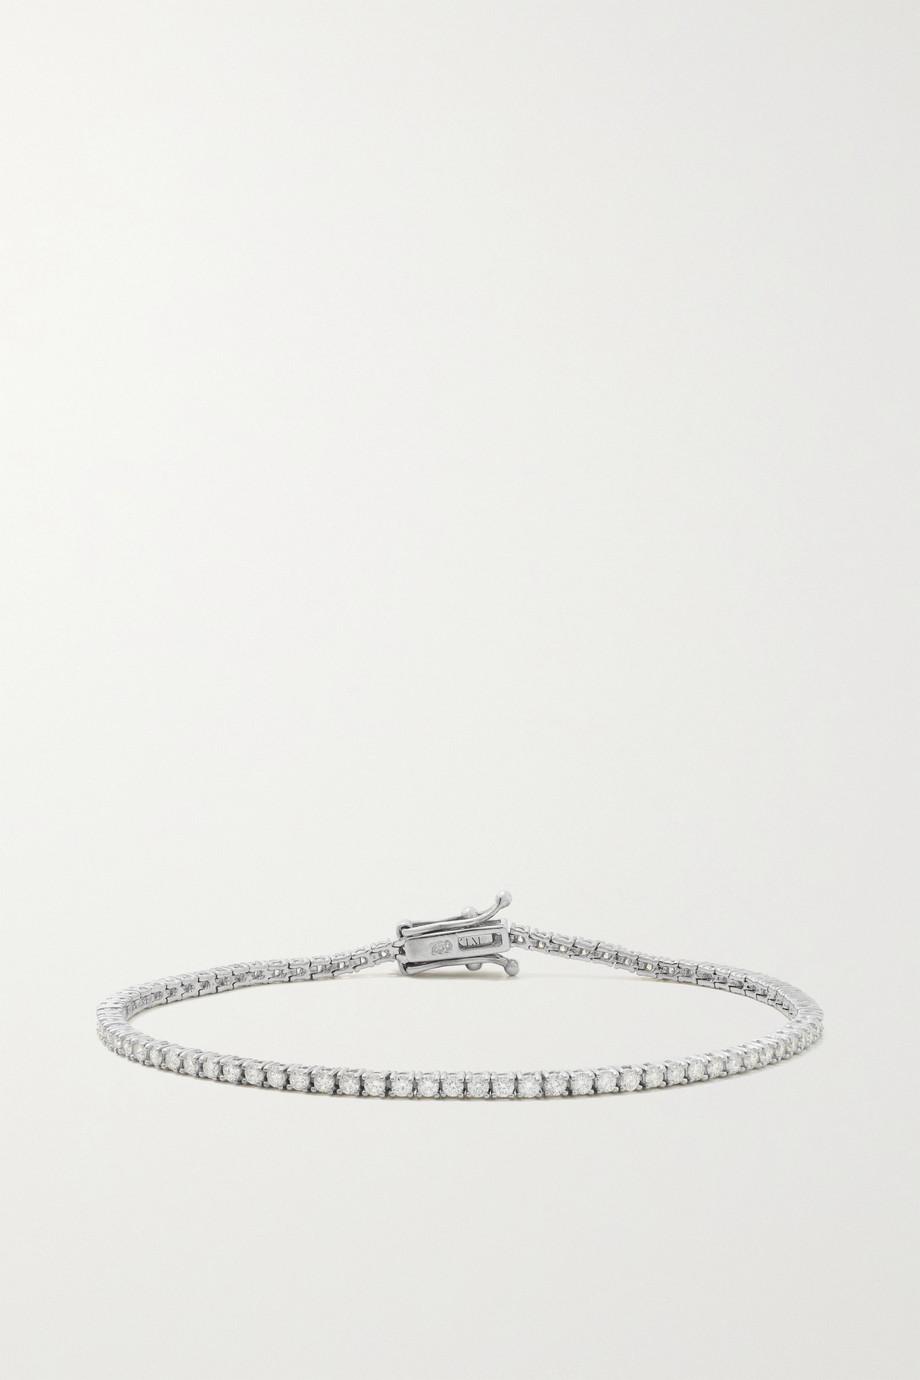 KATKIM White gold diamond bracelet